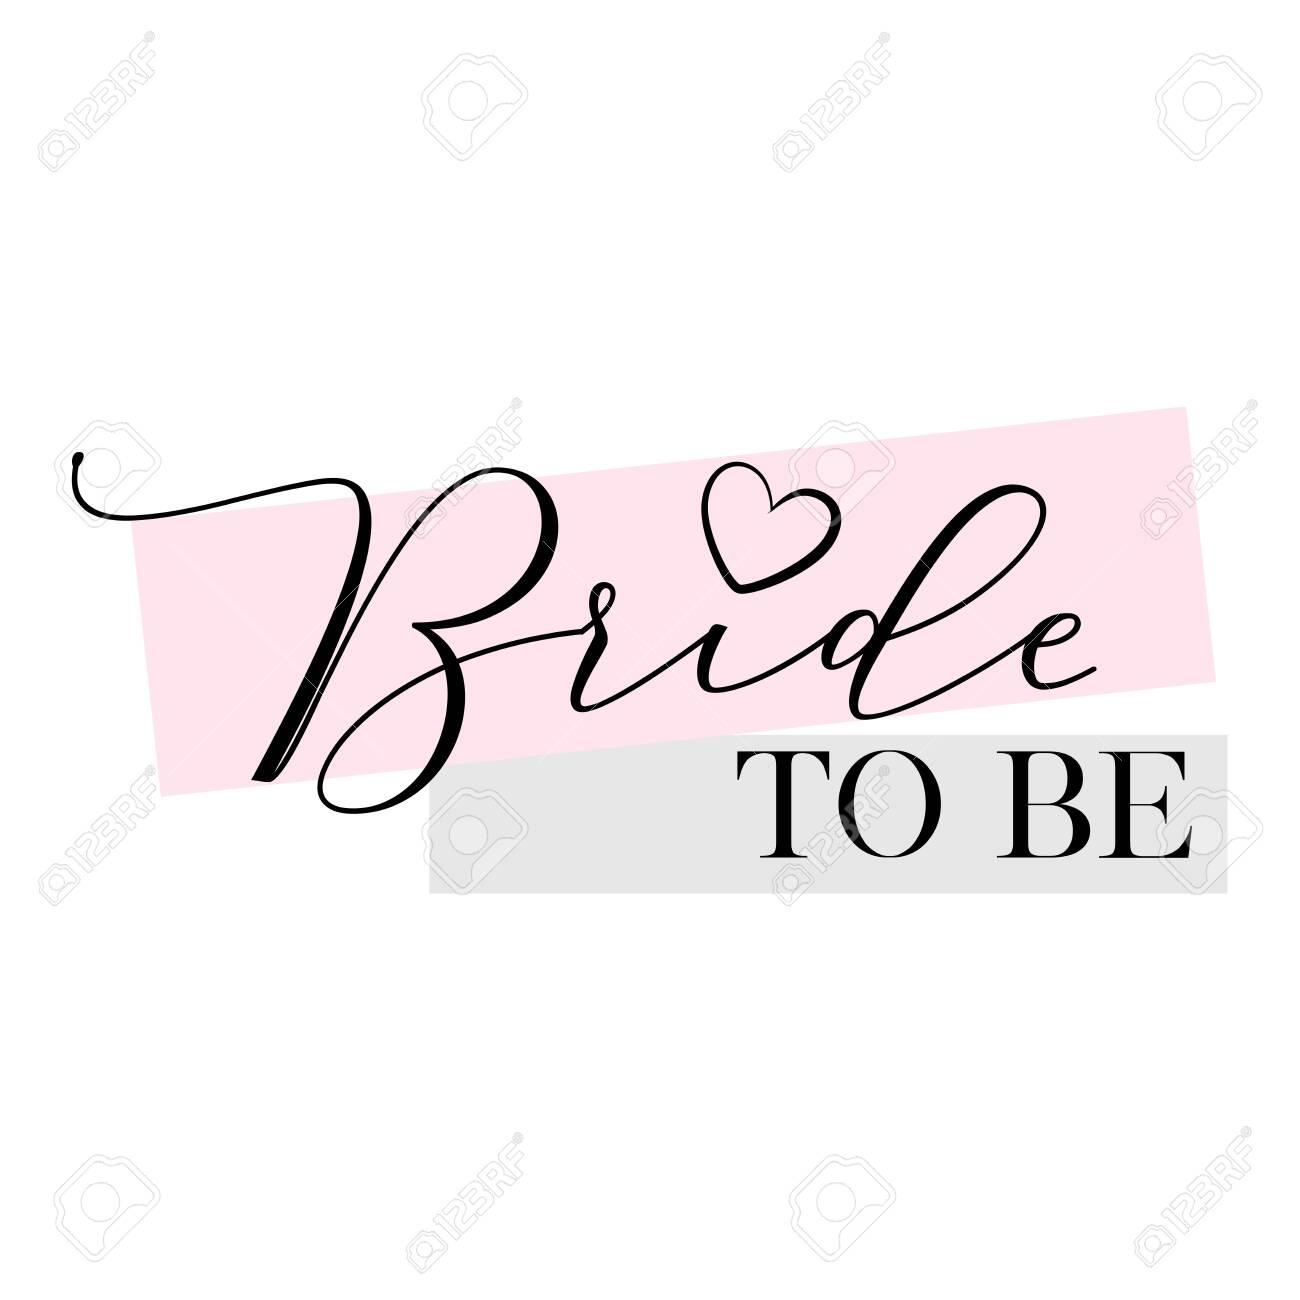 Beautiful Bride Bride-to-be Wedding Dress Card Bridal Shower Card Rustic Bridal Shower